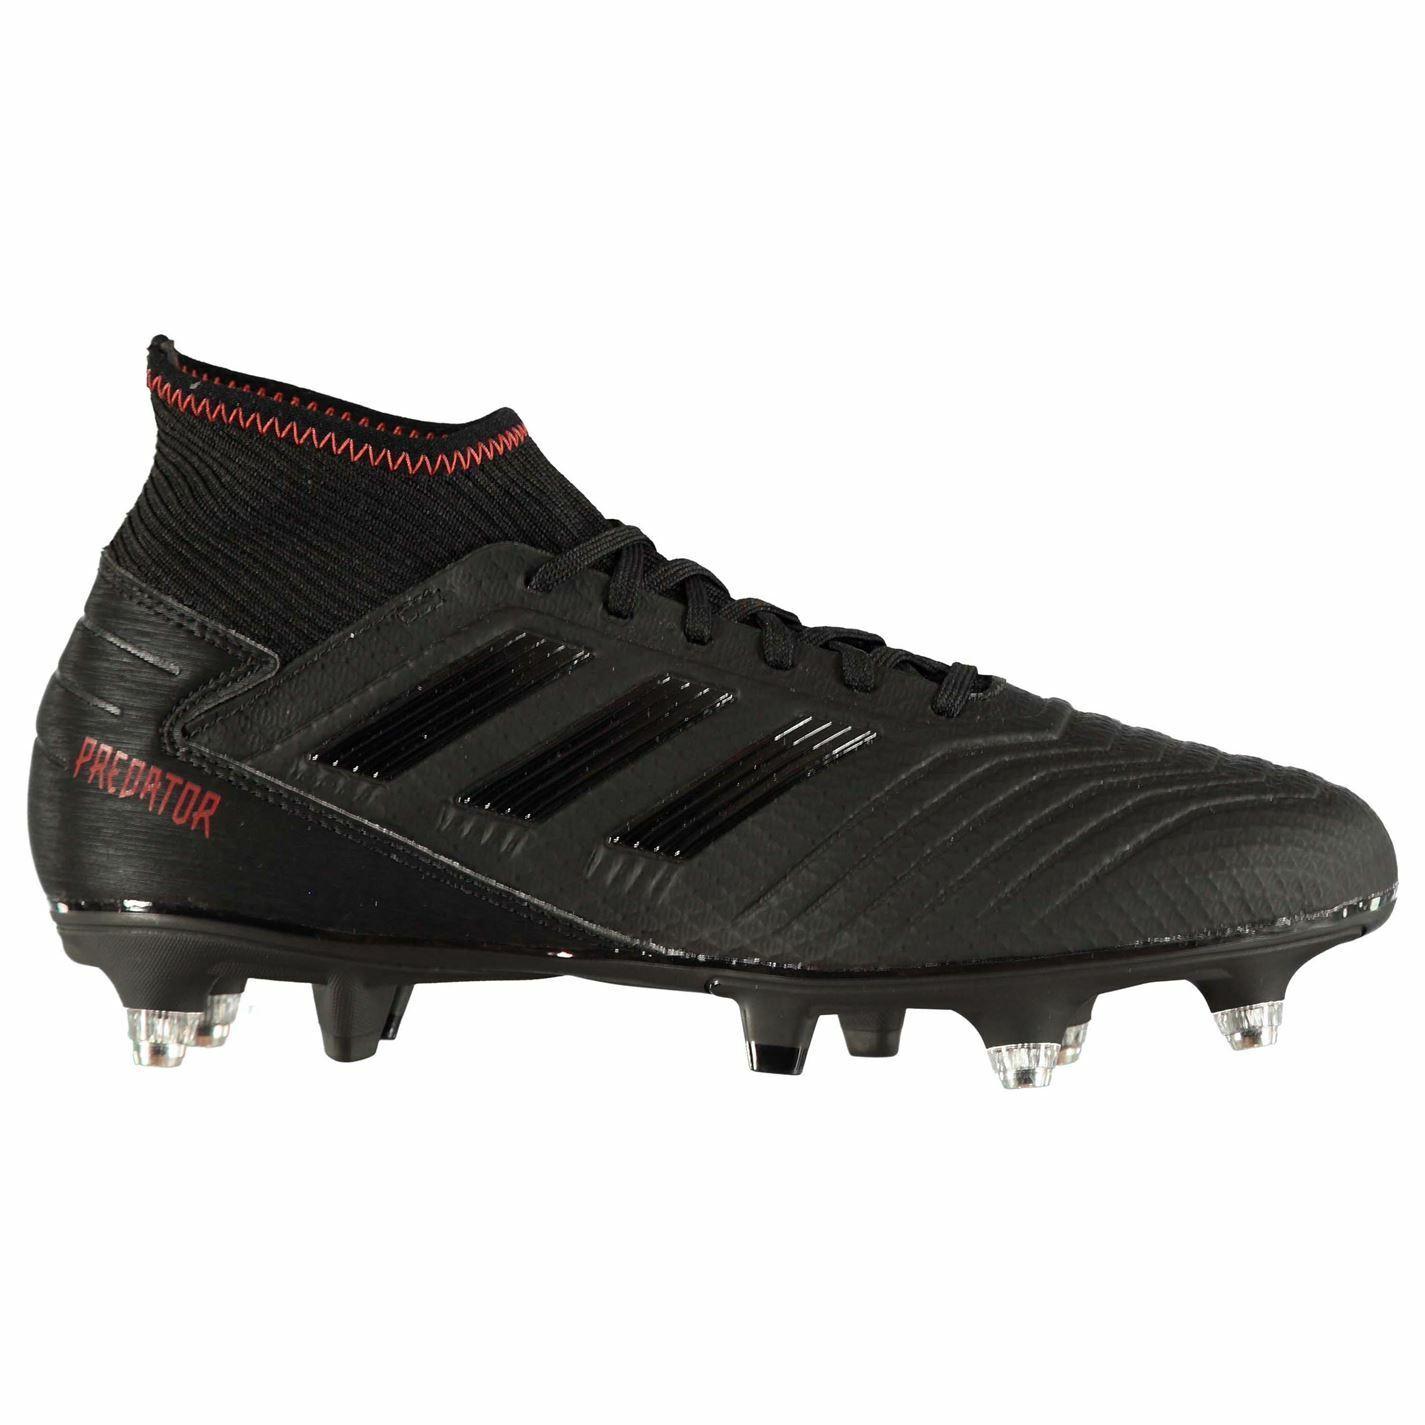 Adidas Projoator 19.3 Sg Fútbol botas Para Hombres Caballeros terreno blando Cordones atados